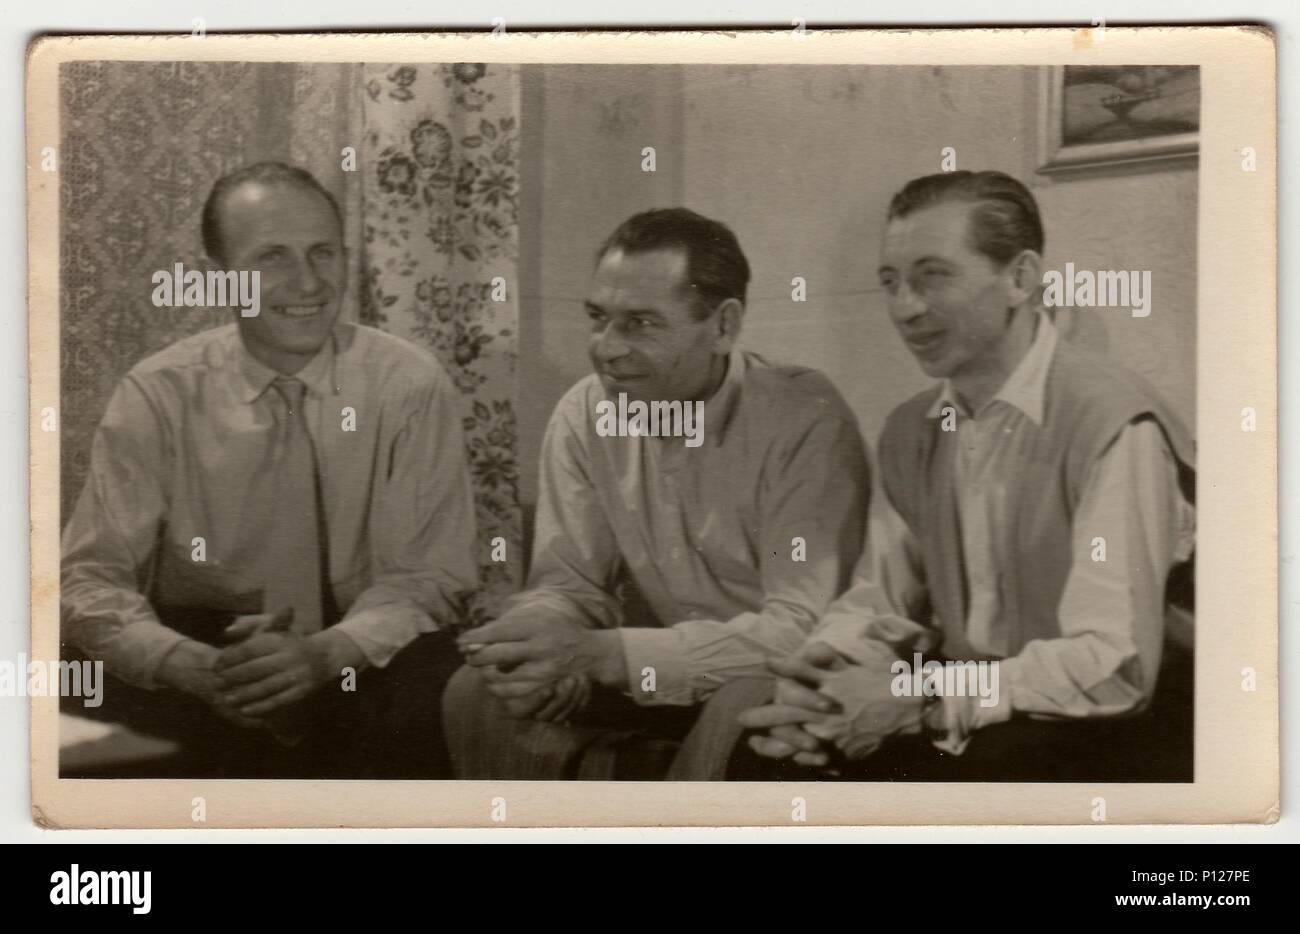 THE CZECHOSLOVAK SOCIALIST REPUBLIC - 1960s: Vintage photo shows men have a pleasant time at home. - Stock Image